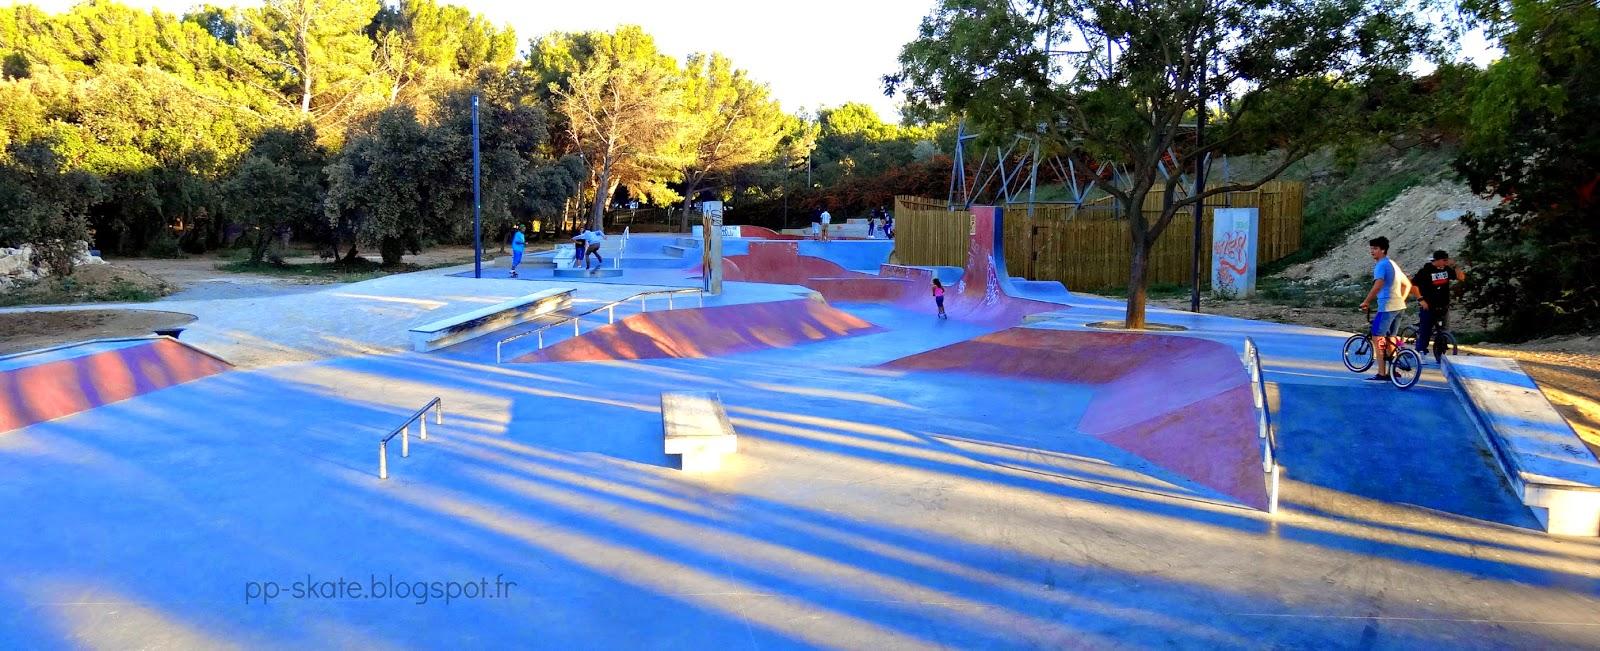 Skate park Istres